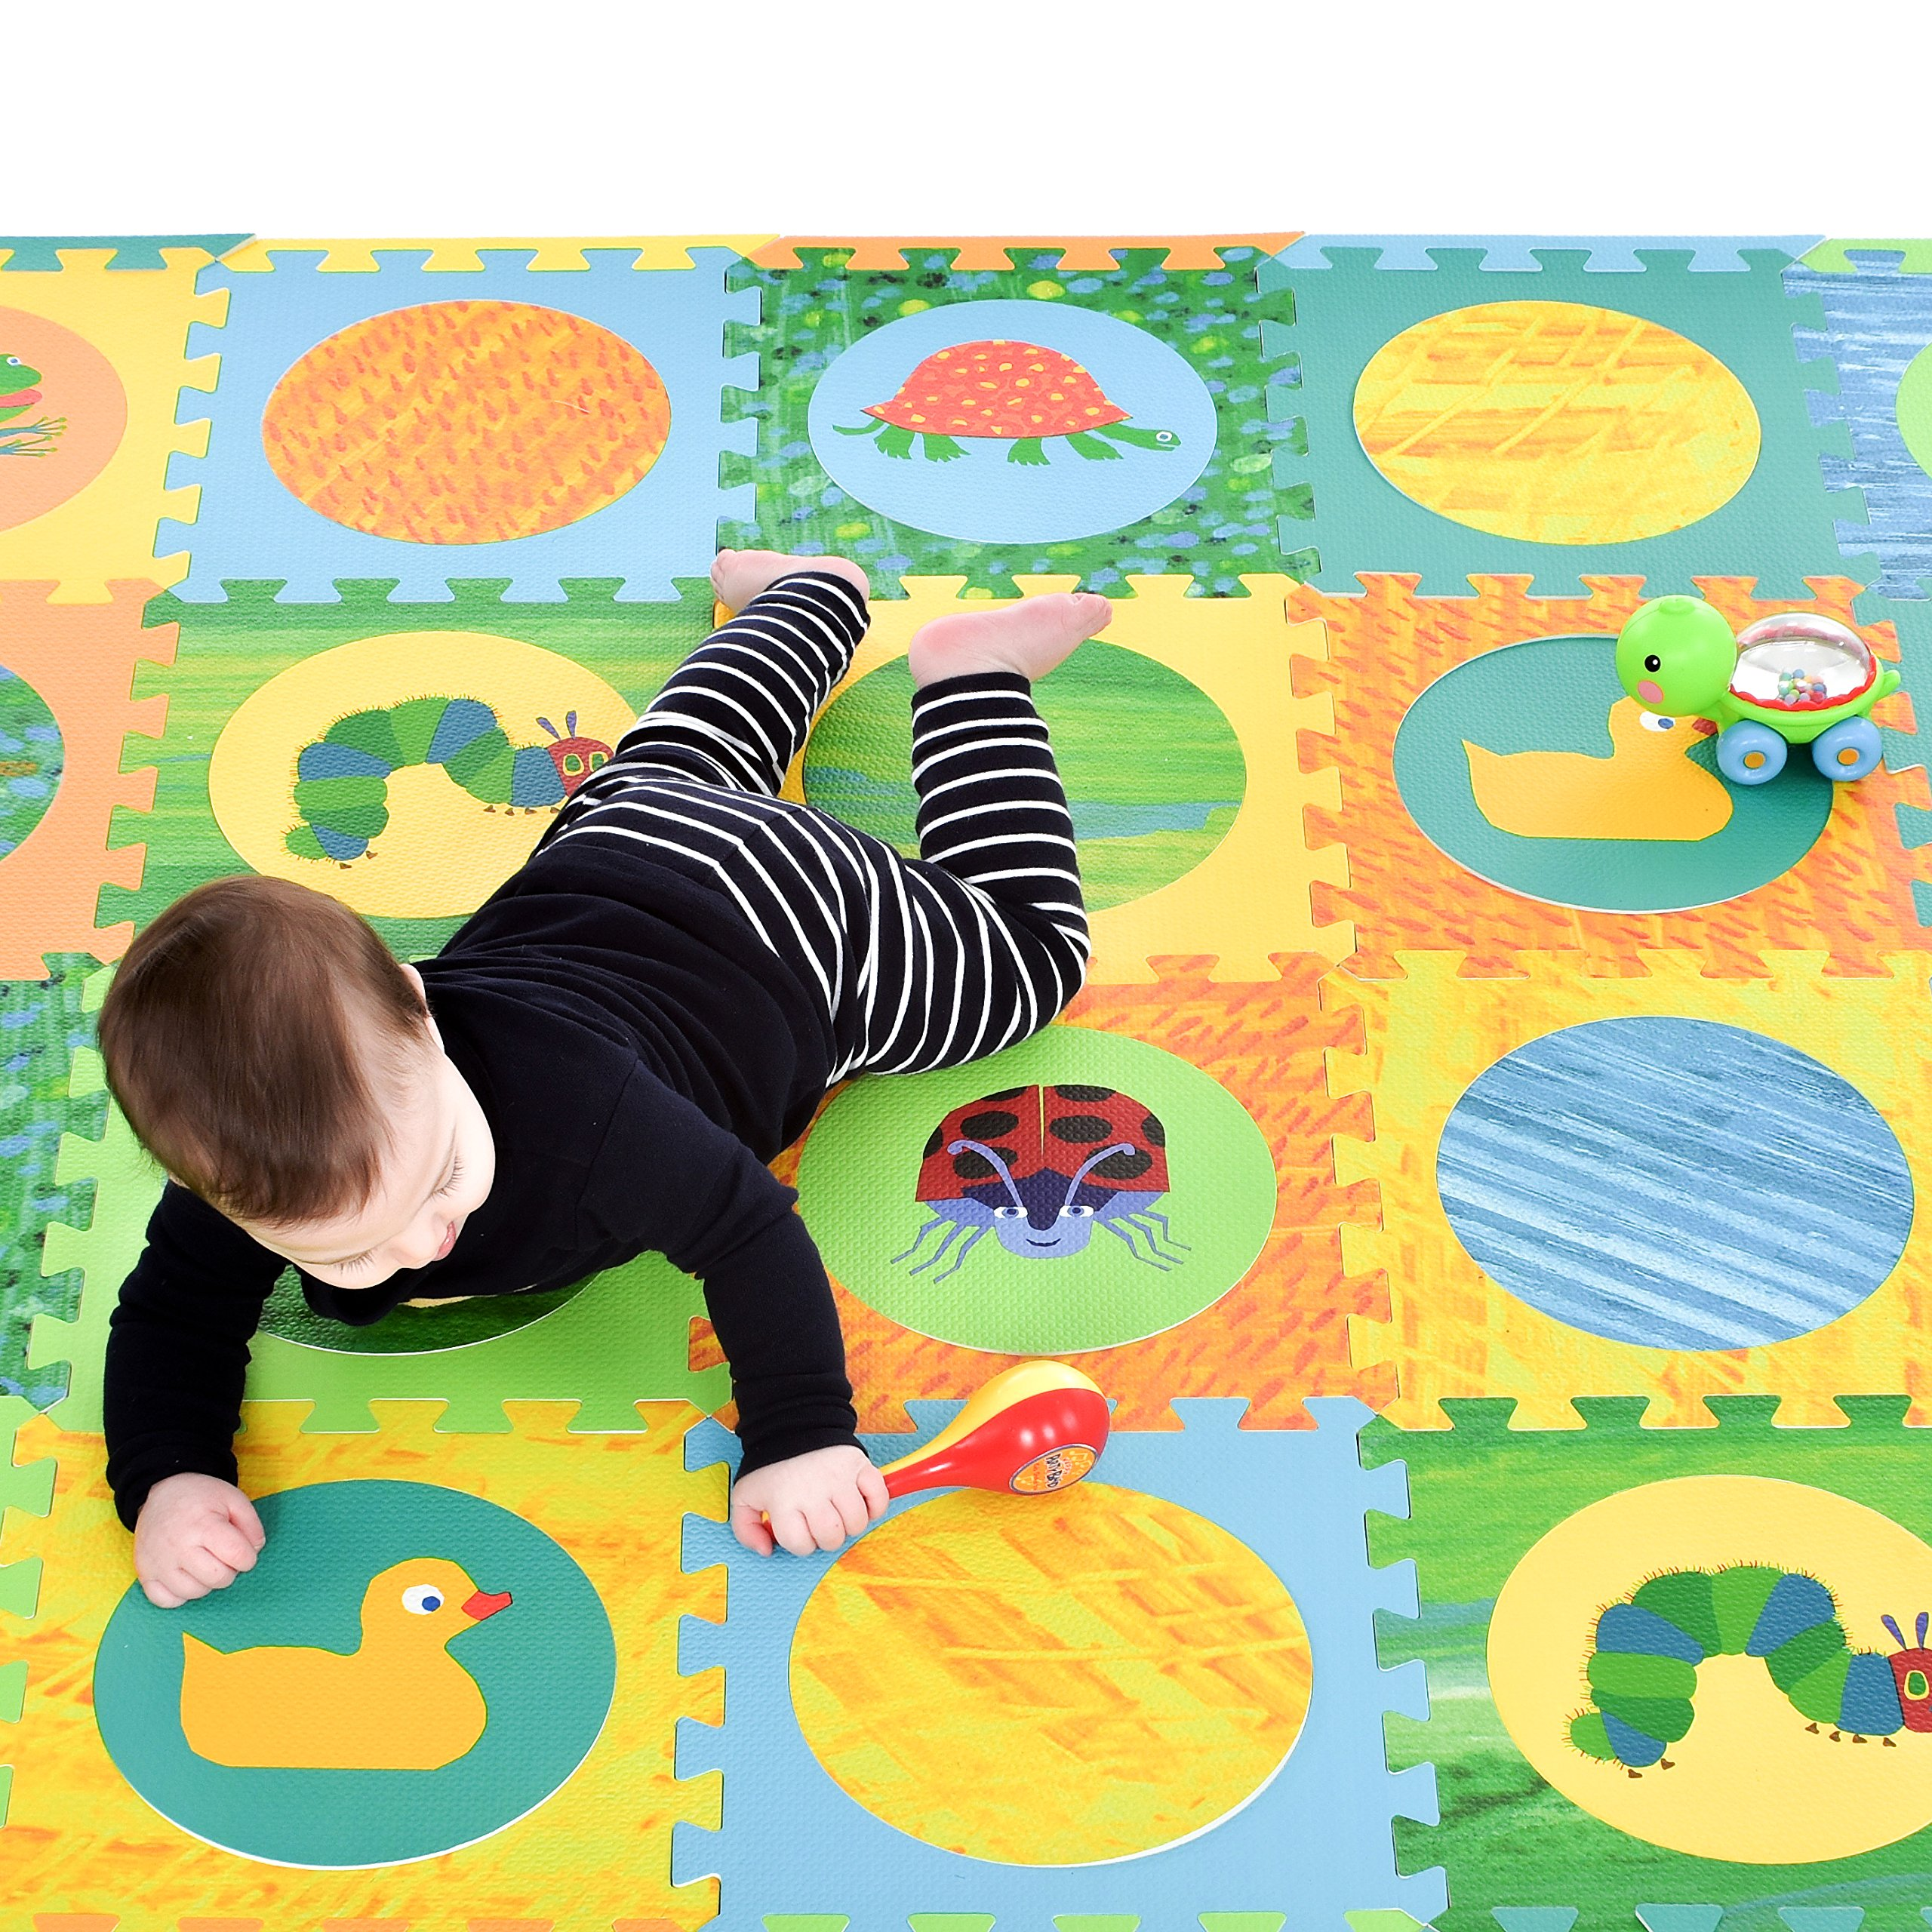 itm babies eva mat floor hungry baby play boy infant for foam toxic caterpillar girl puzzle mats tiles non